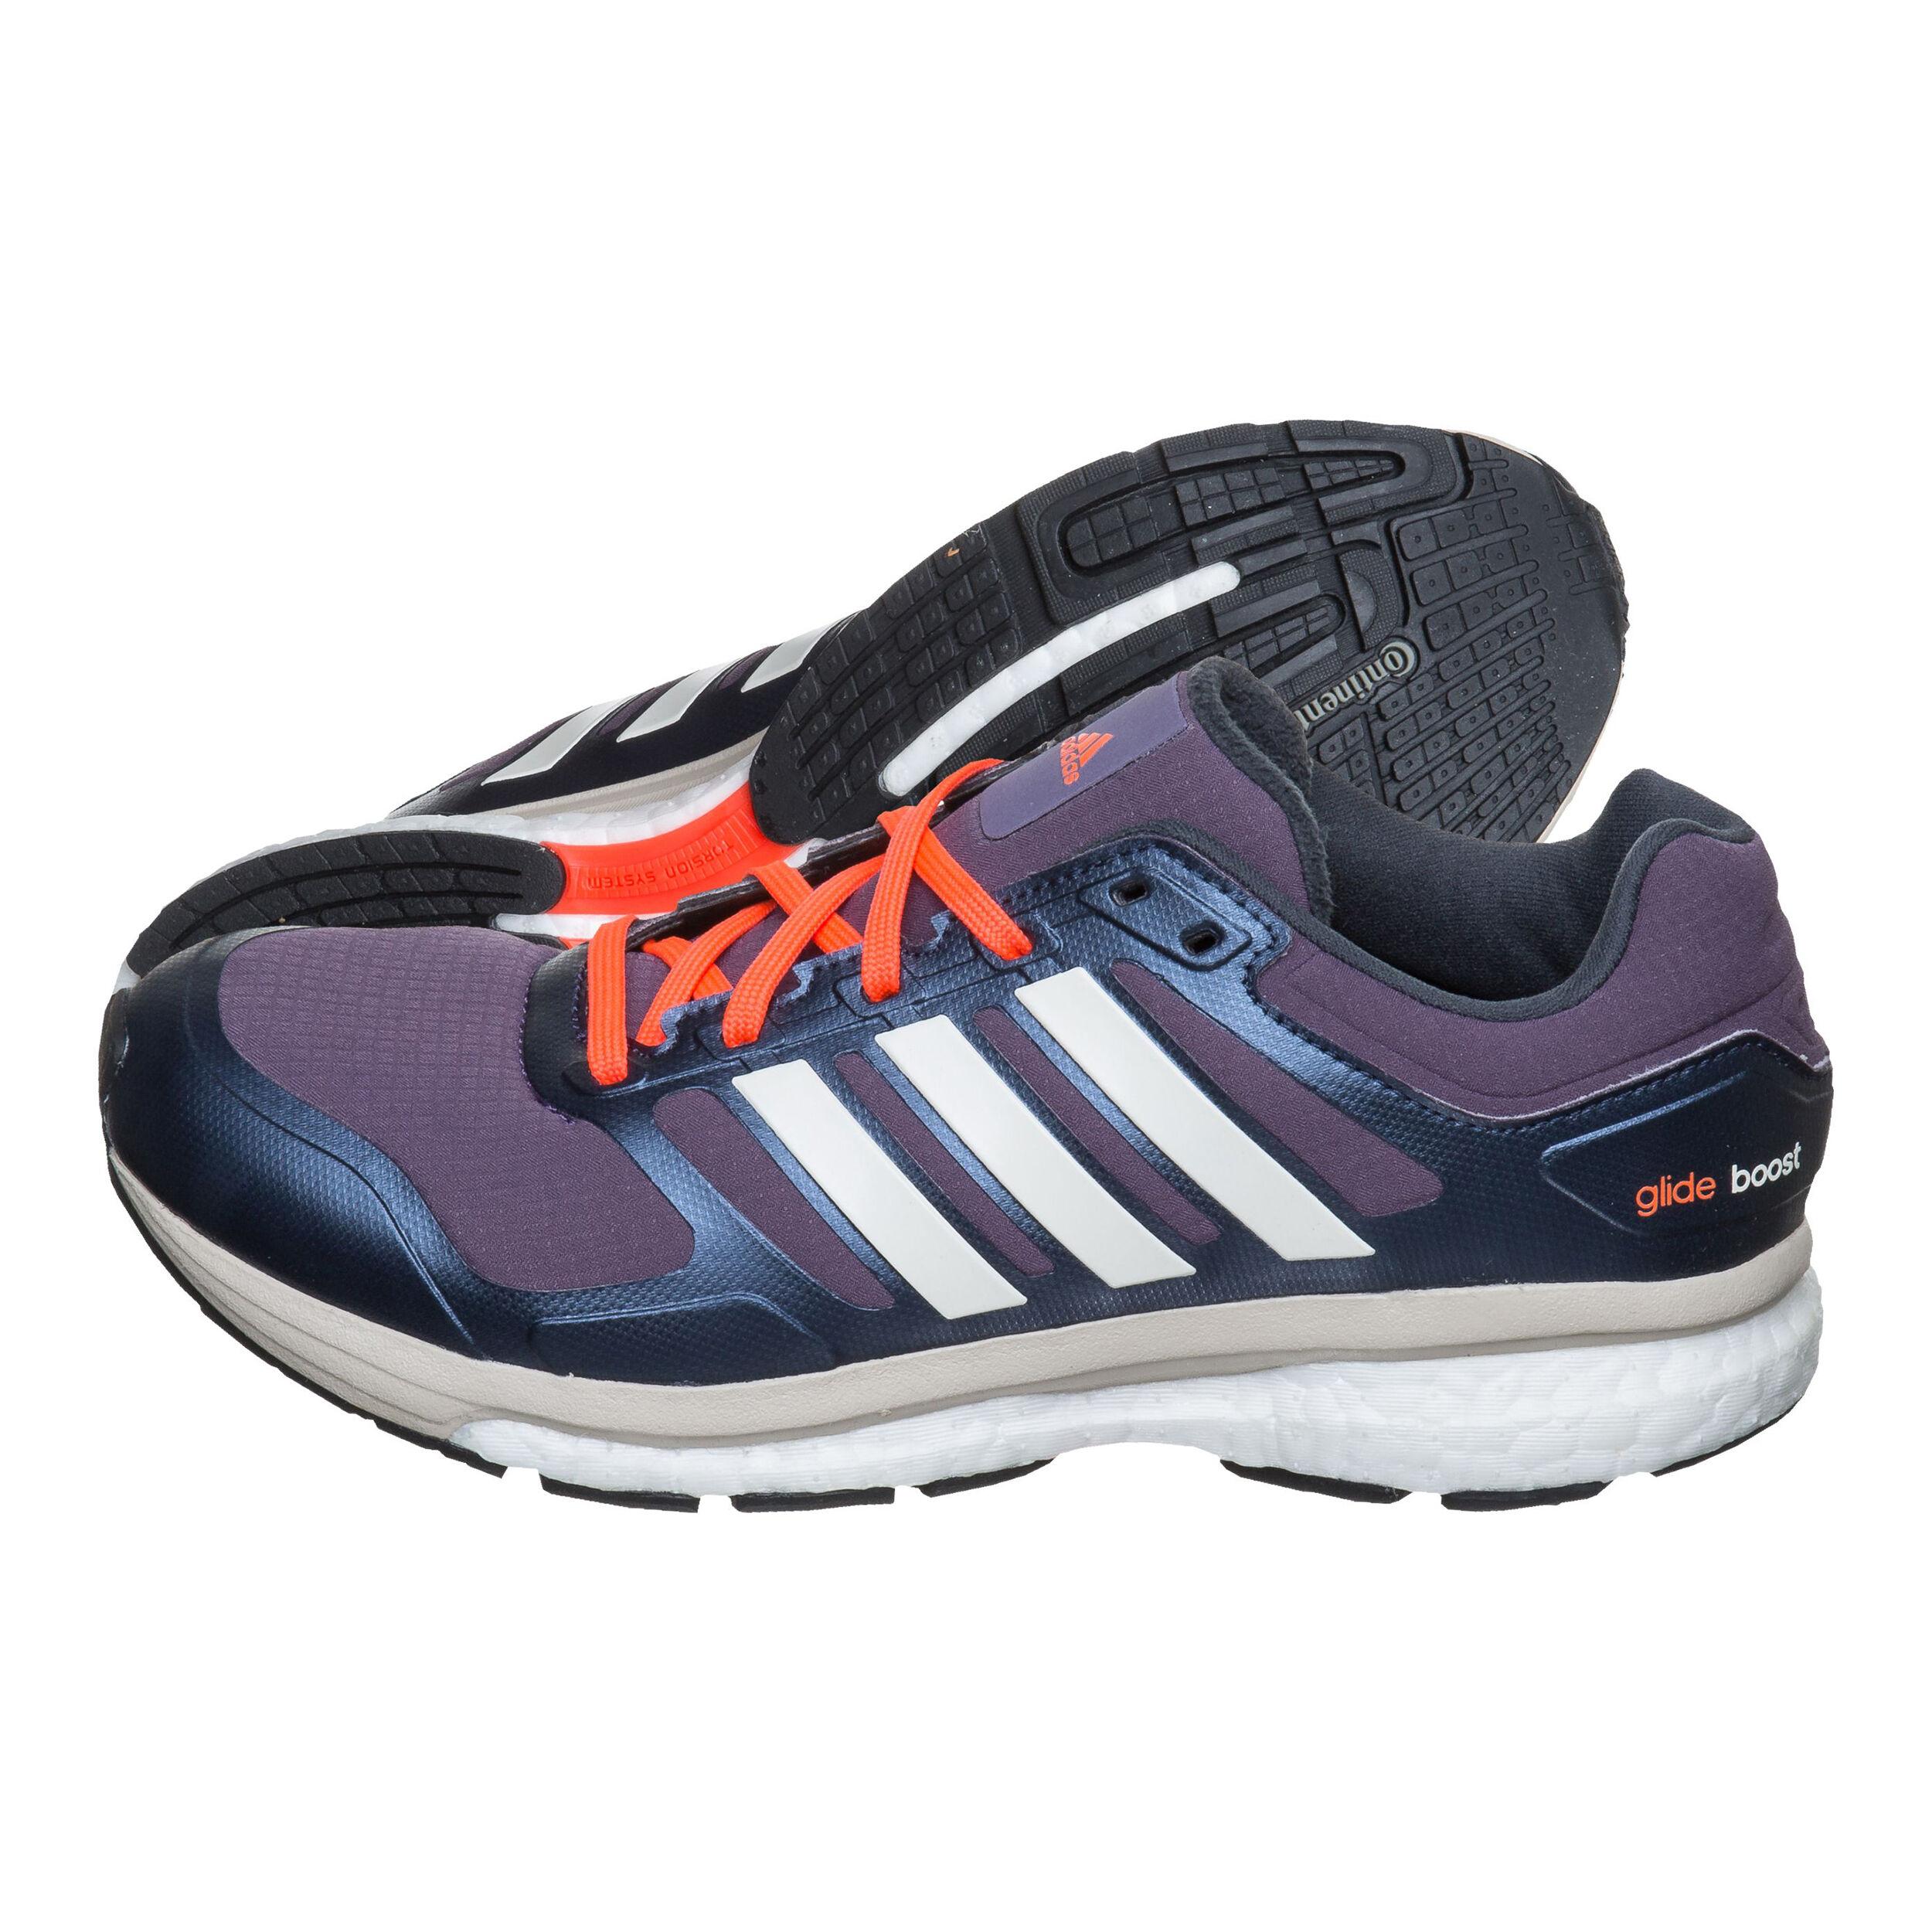 adidas supernova glide boost 7 climaheat women's running